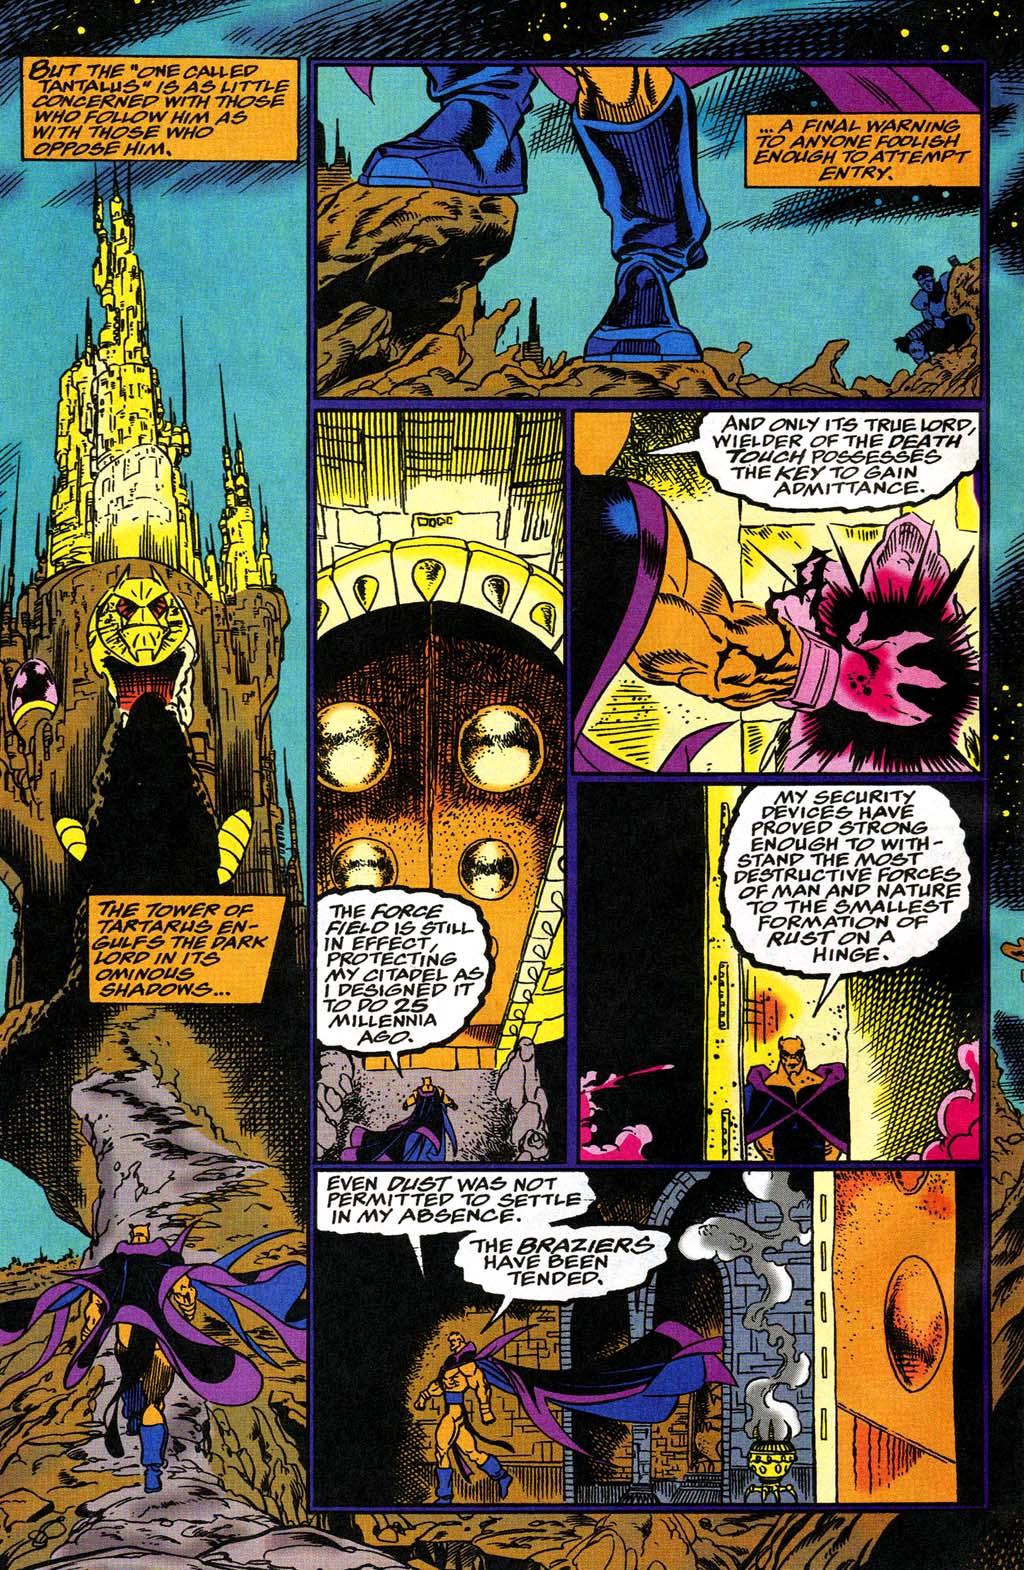 Read online Blackwulf comic -  Issue #8 - 19